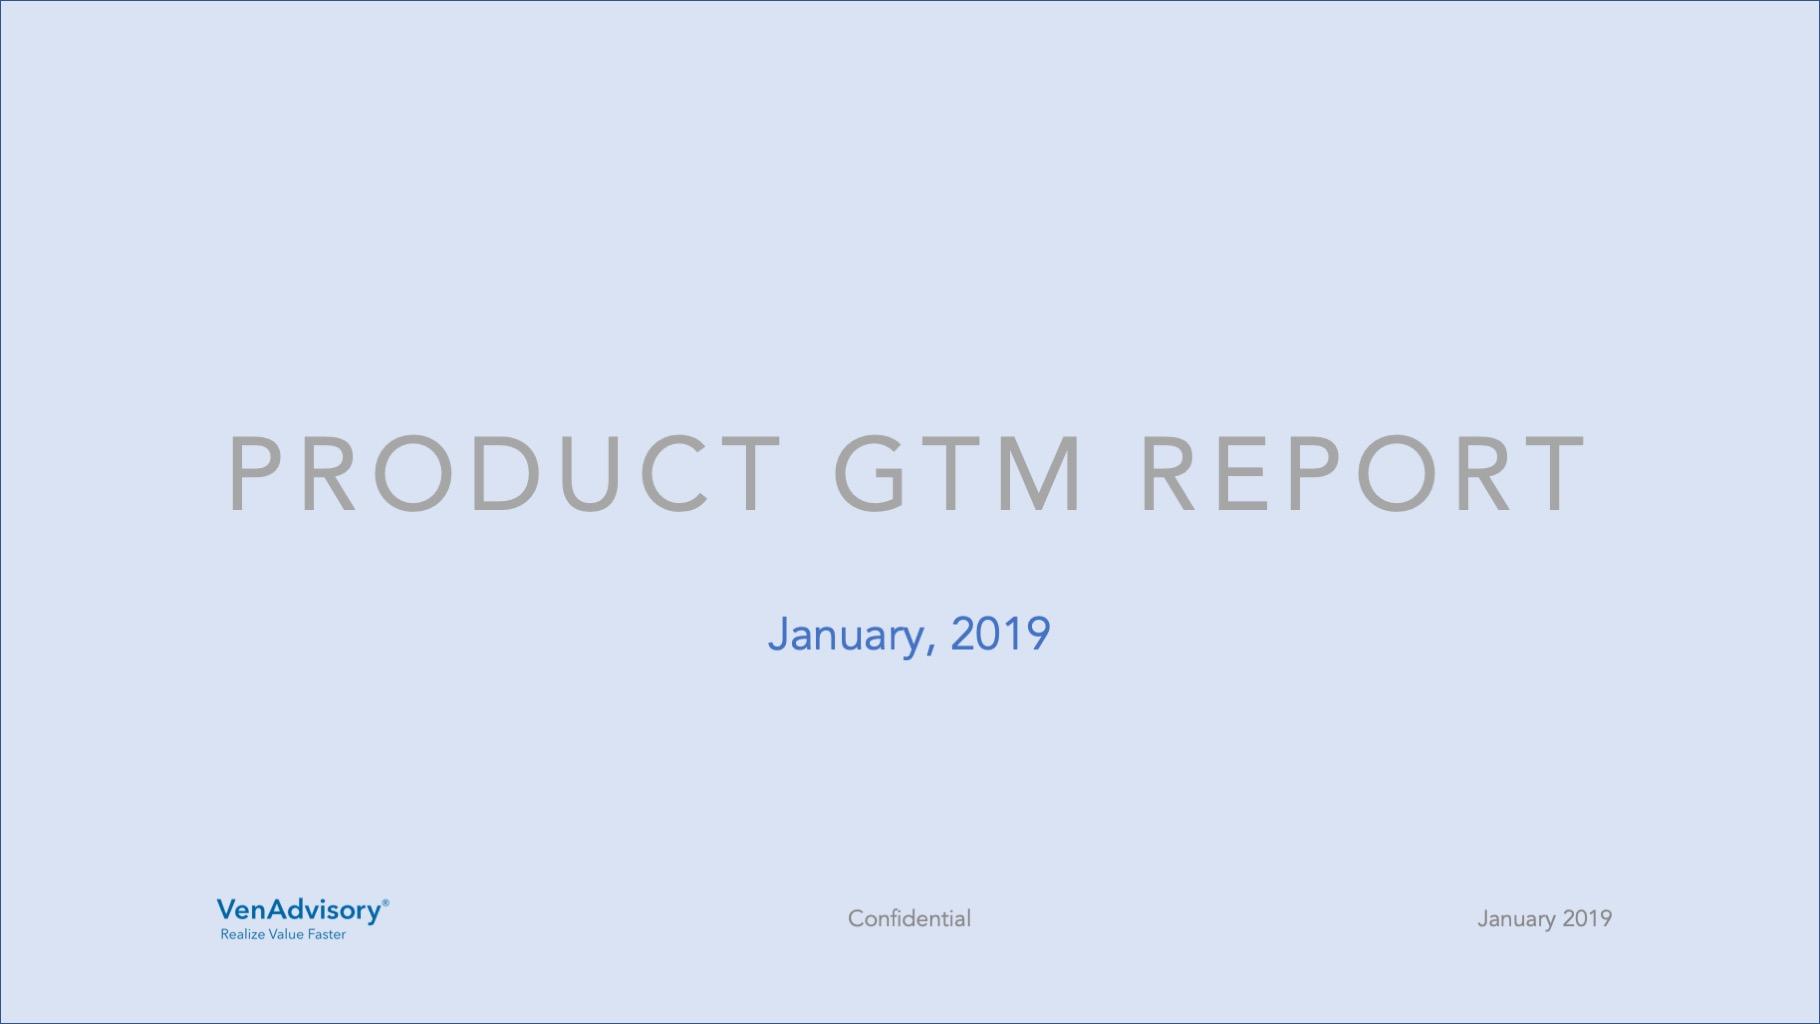 Copy of Analytics Company GTM Market Report, Jan. 2019